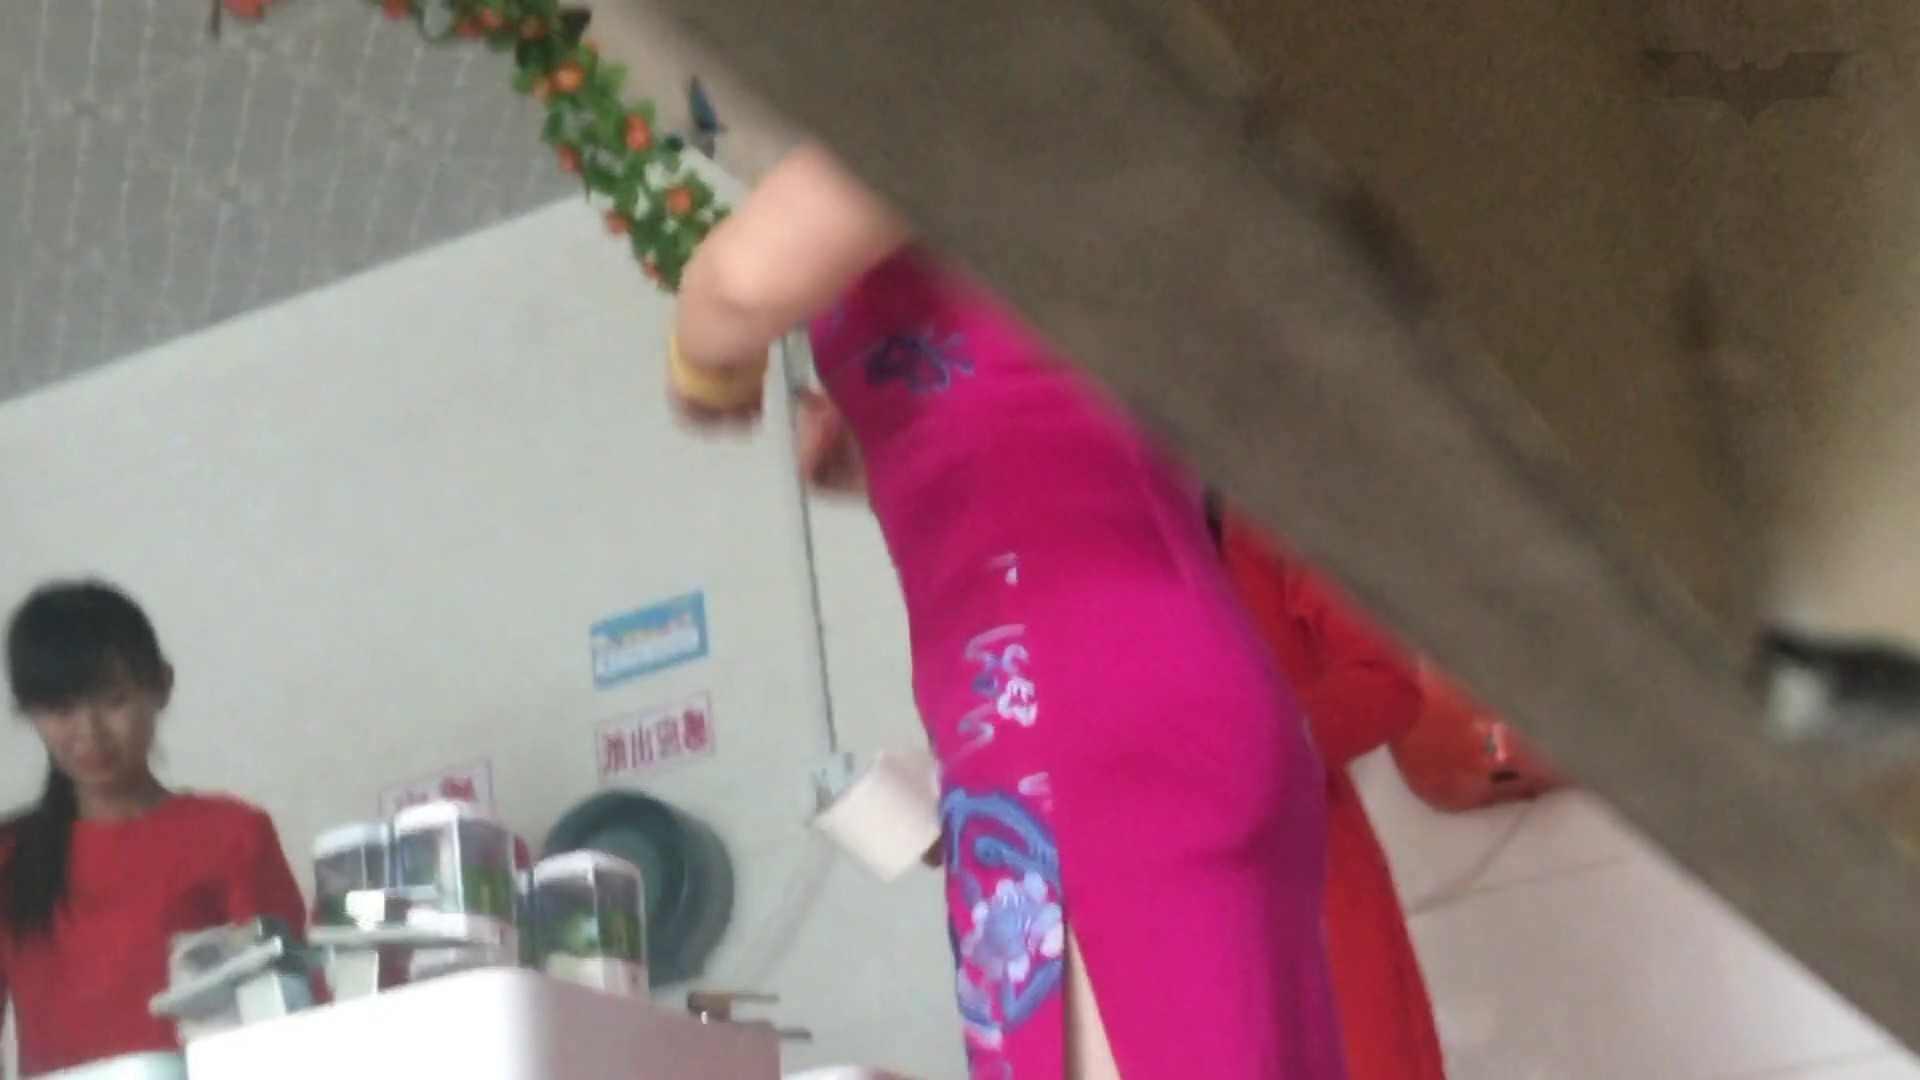 芸術大学ガチ潜入盗撮 JD盗撮 美女の洗面所の秘密 Vol.106 潜入 エロ画像 83画像 20